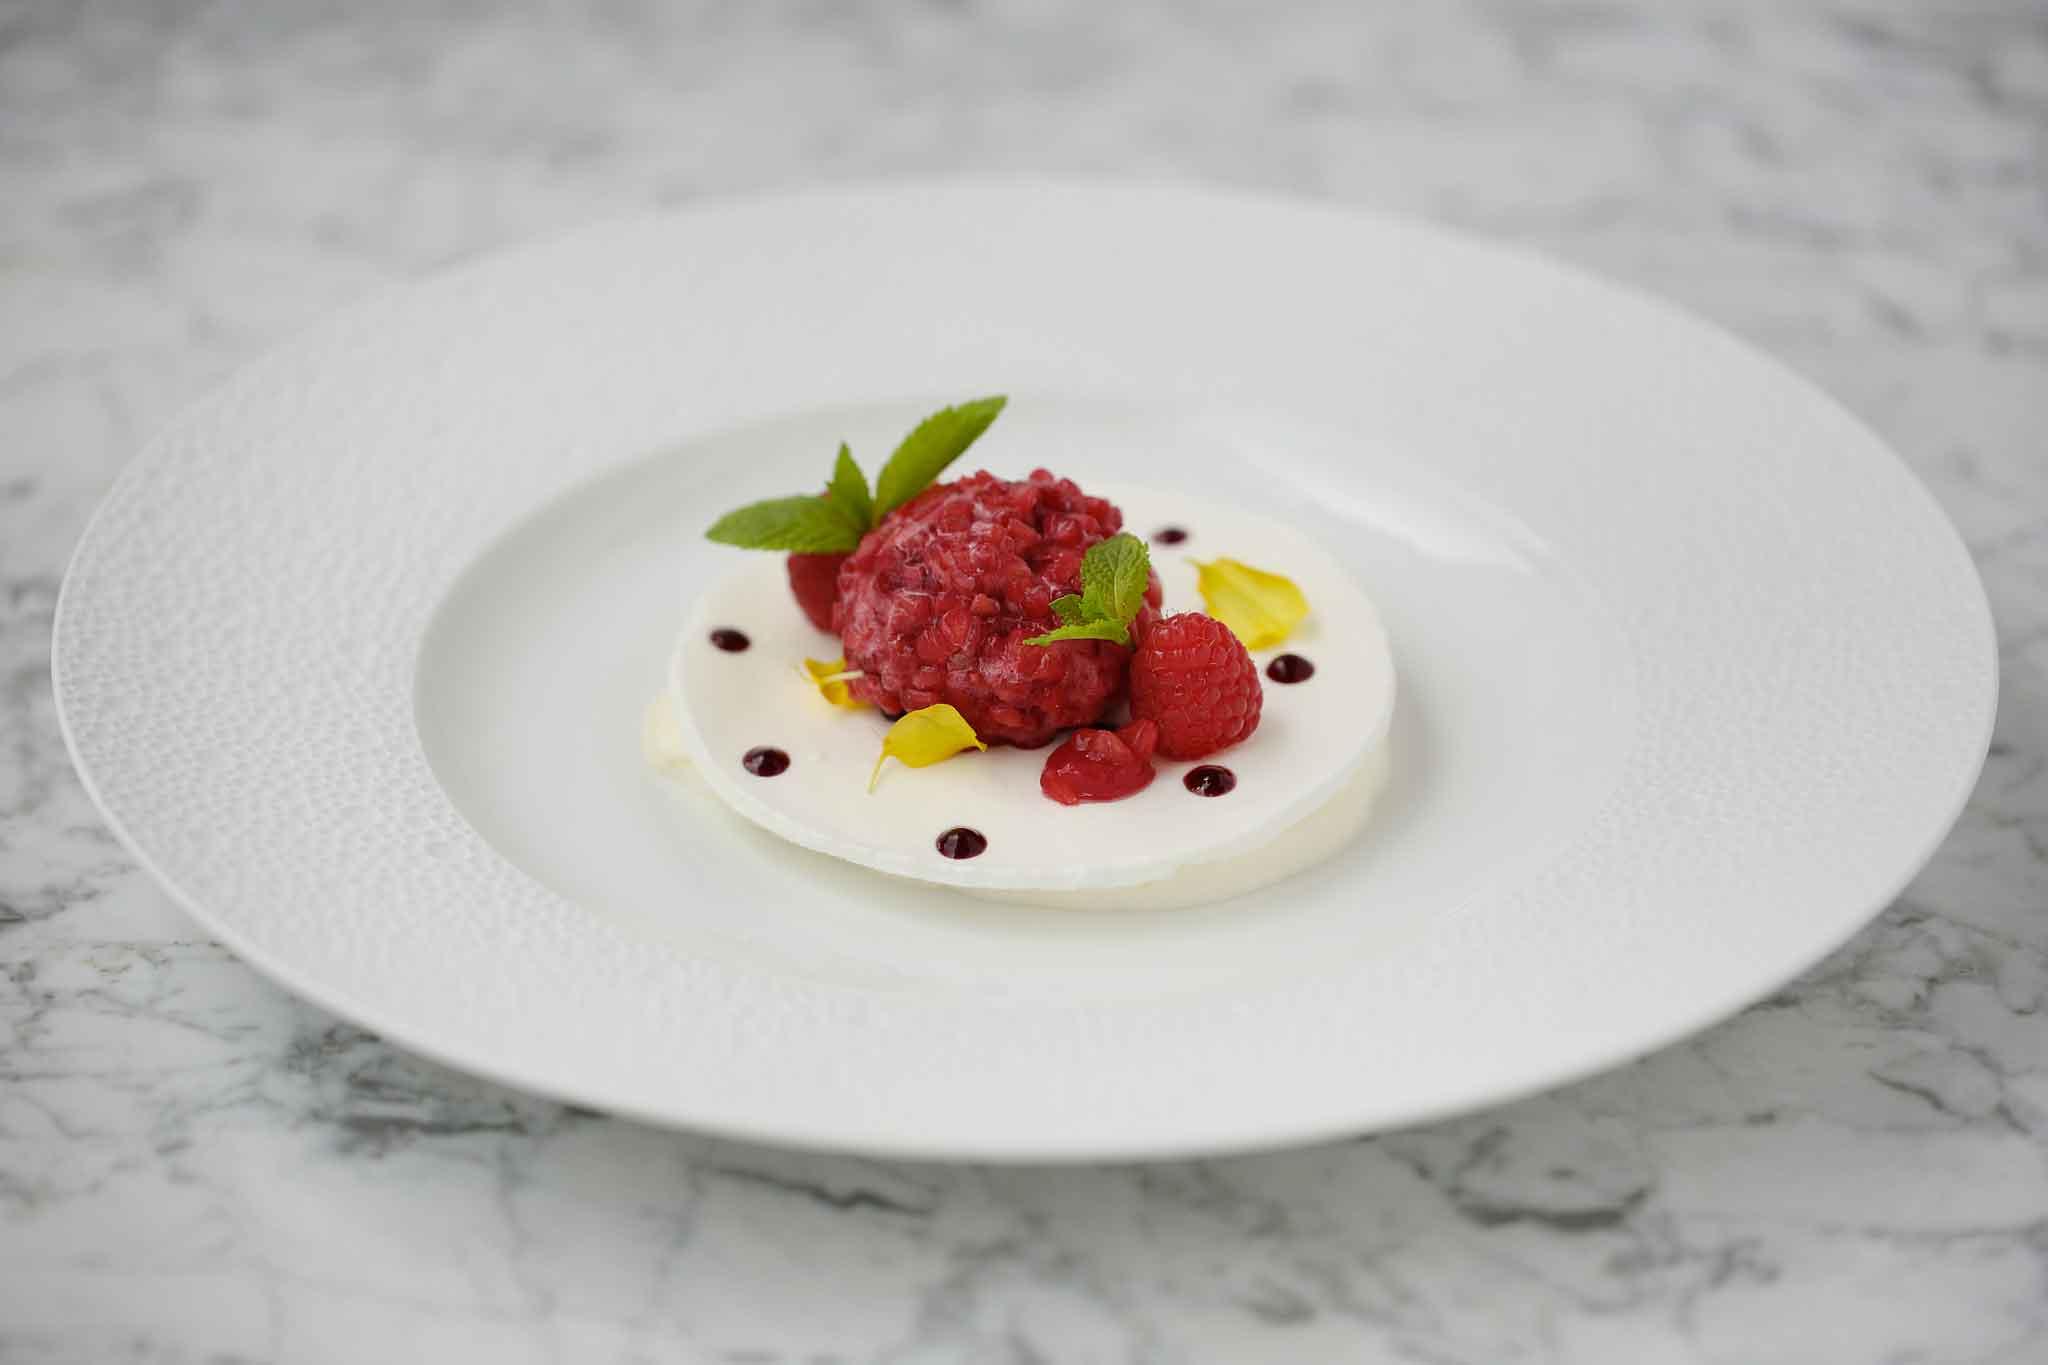 mousse-allo-yogurt-e-zenzeropralina-ai-lamponi-foto-by-f-r